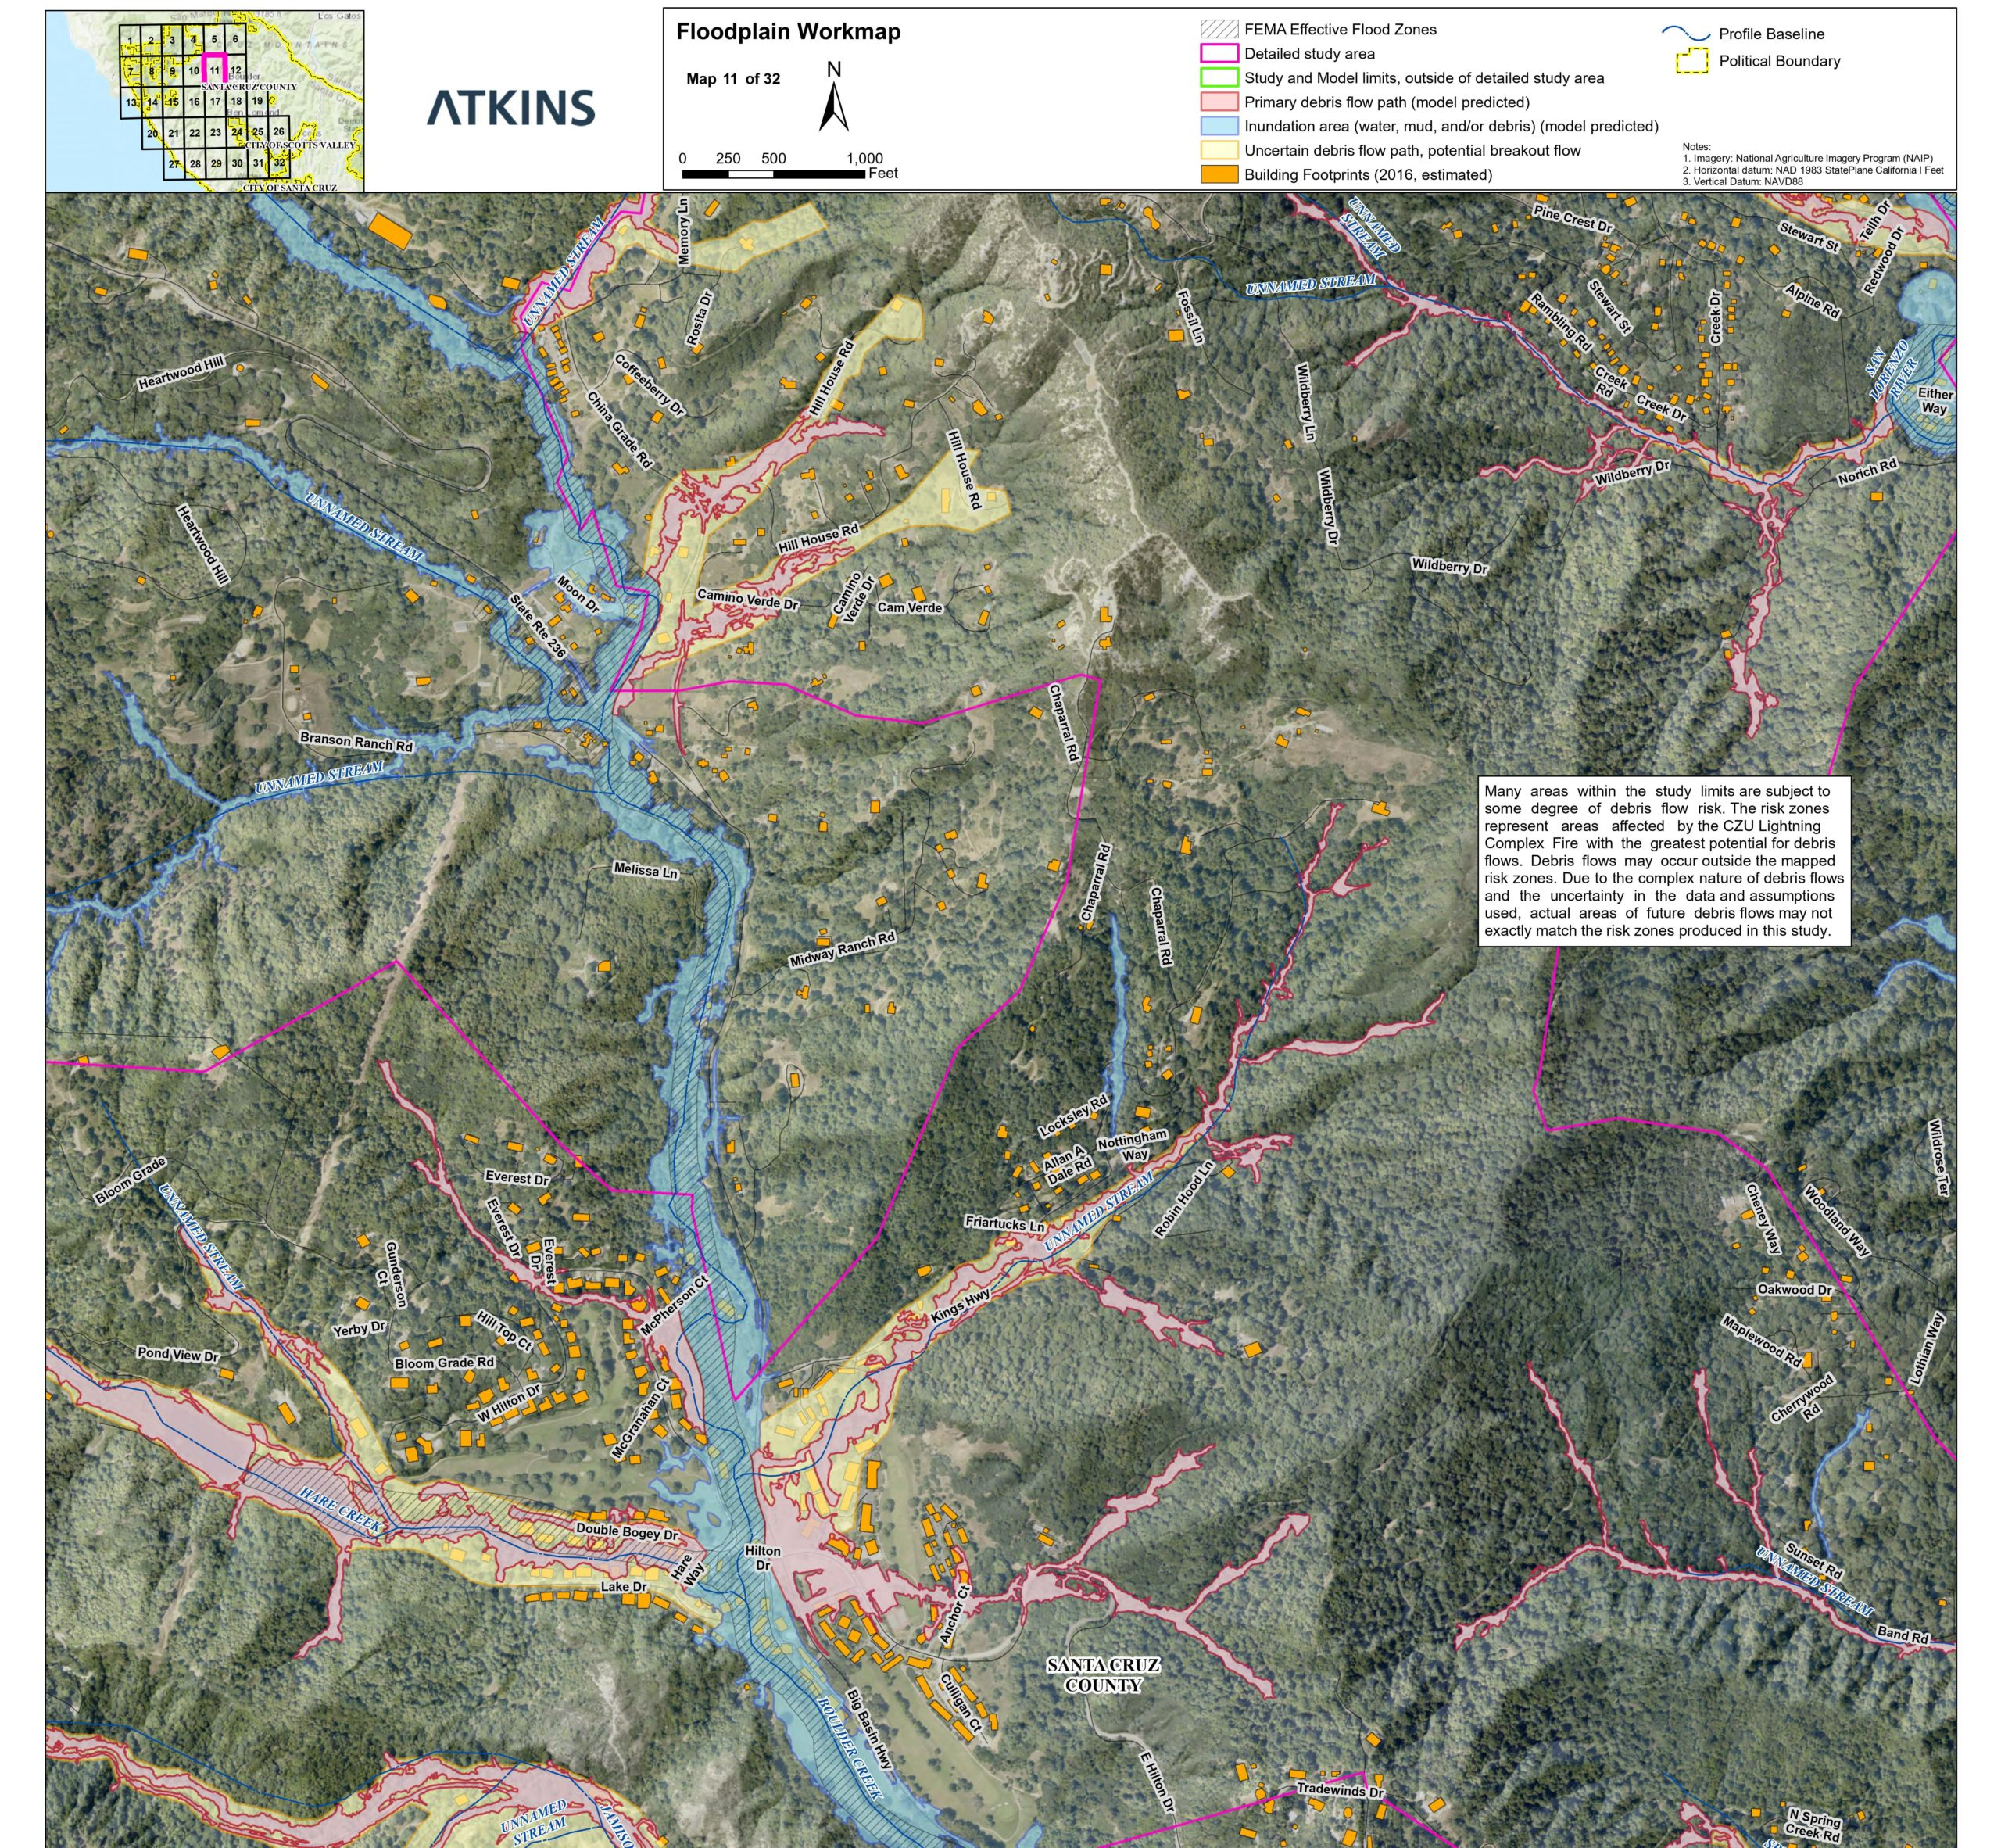 map of potential debris flow areas in Santa Cruz Mountains